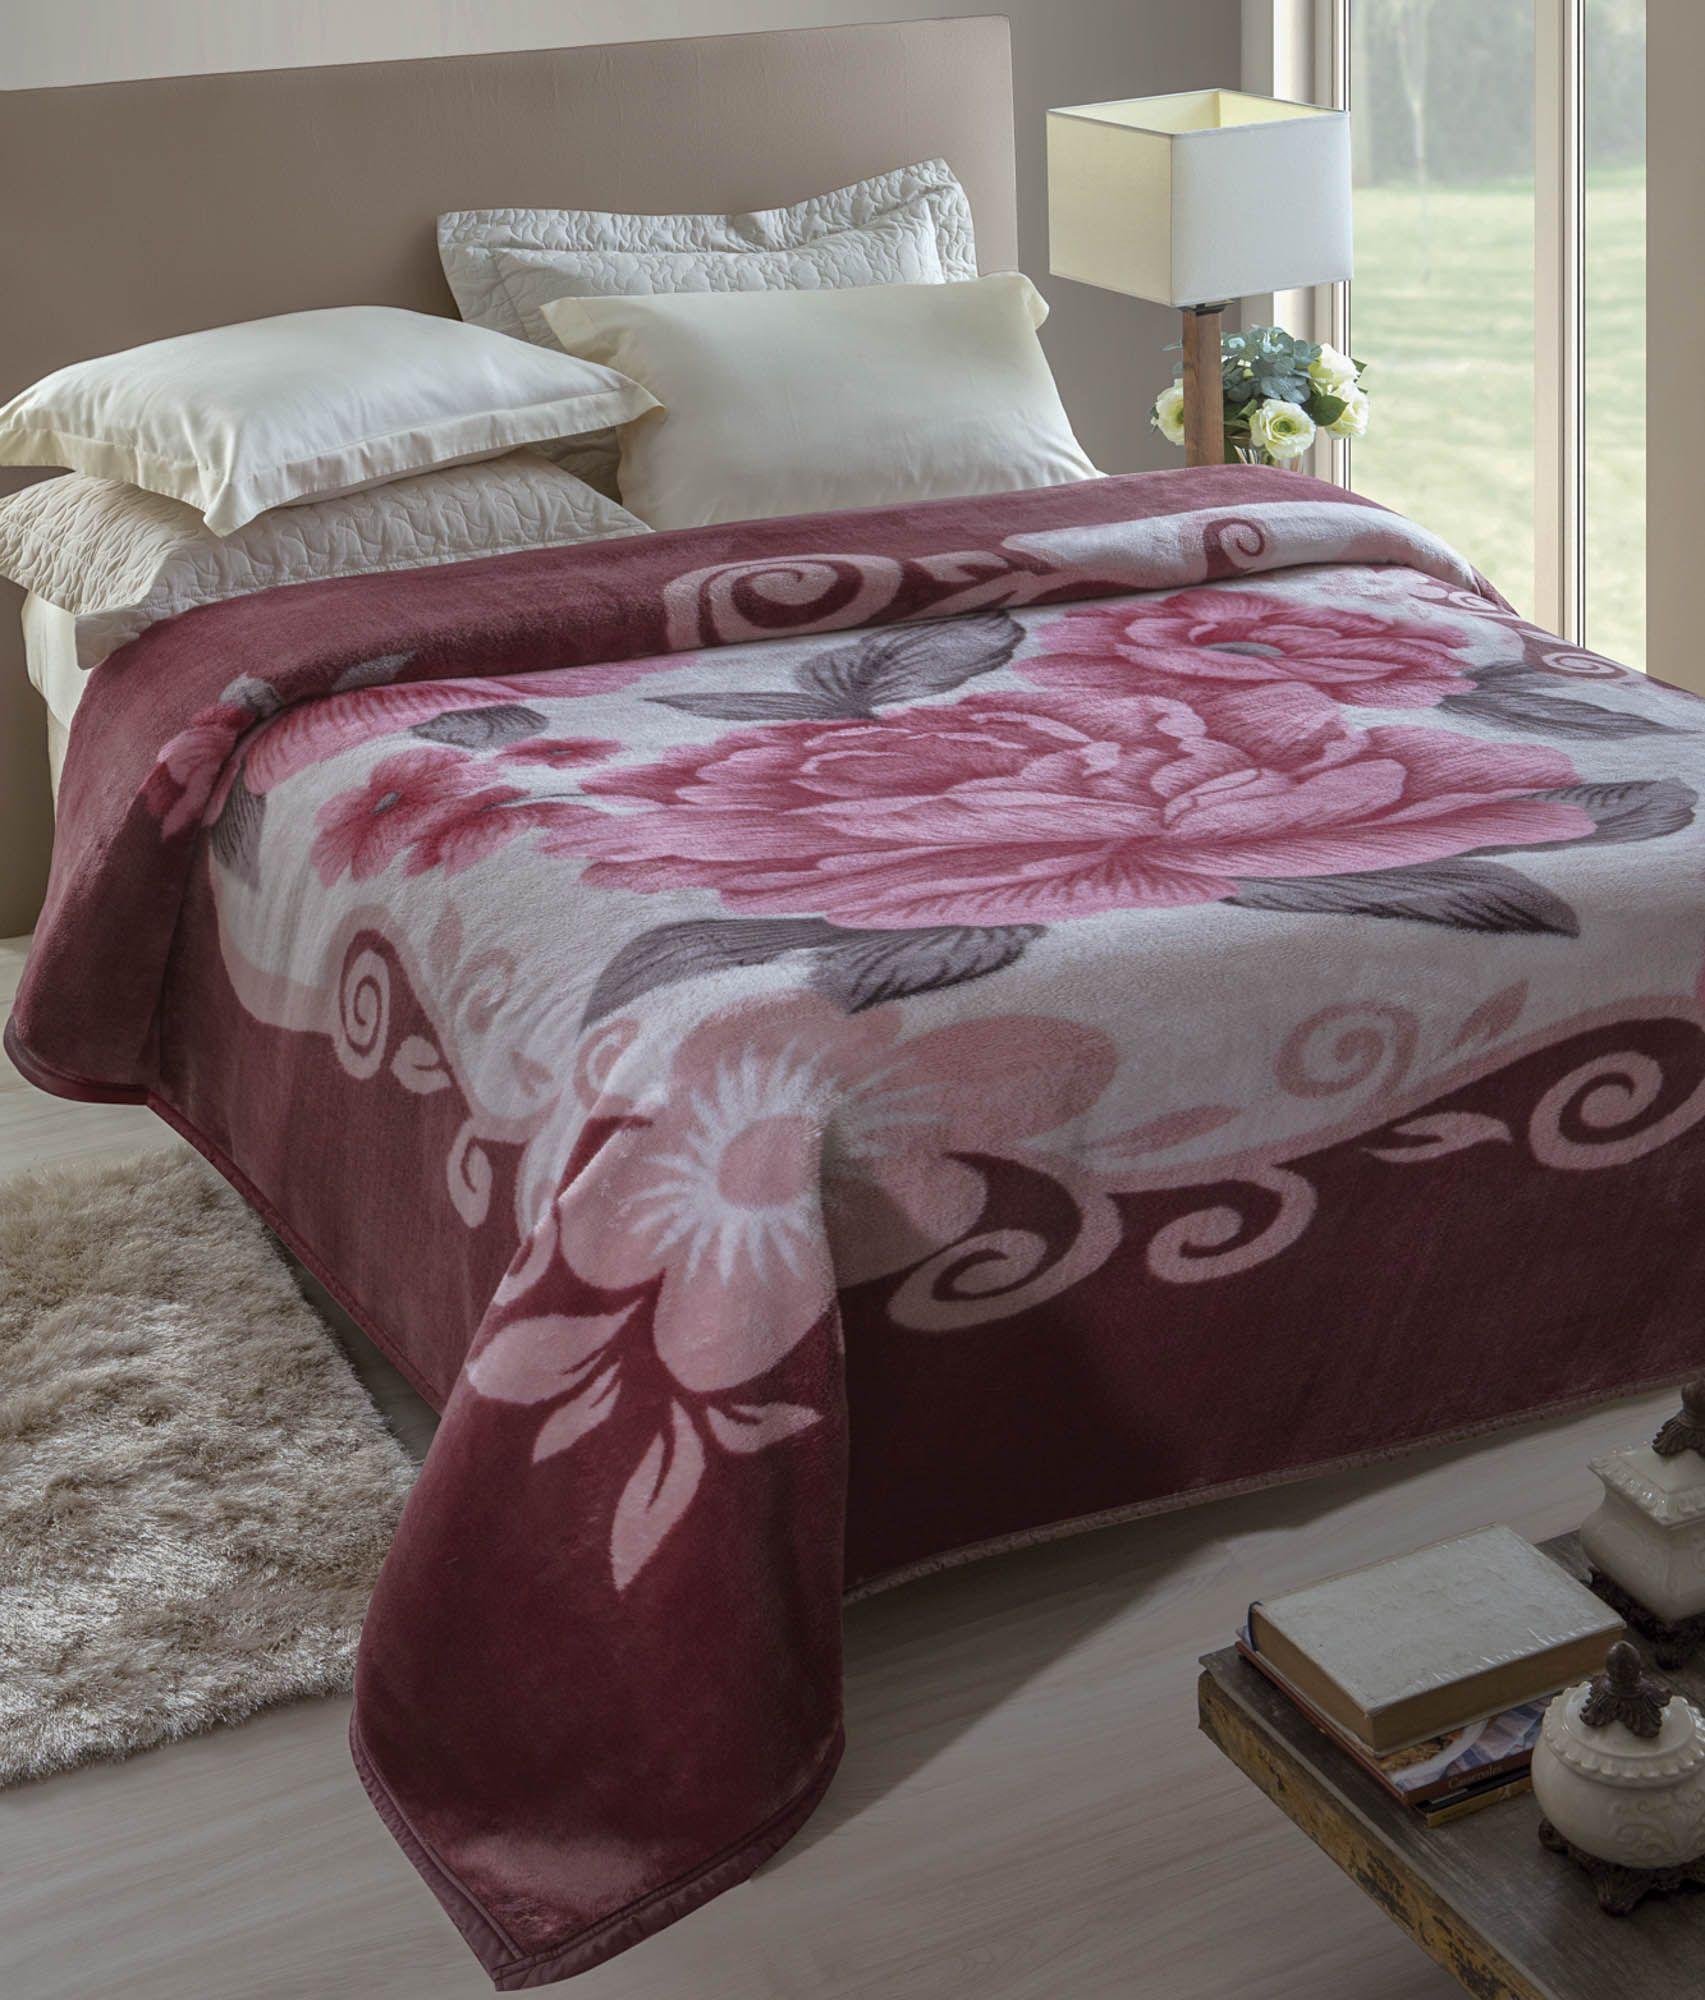 Cobertor Microfibra Jolitex Araneda Kyor Plus King 2,20 m x 2,40 m 100% Poliester